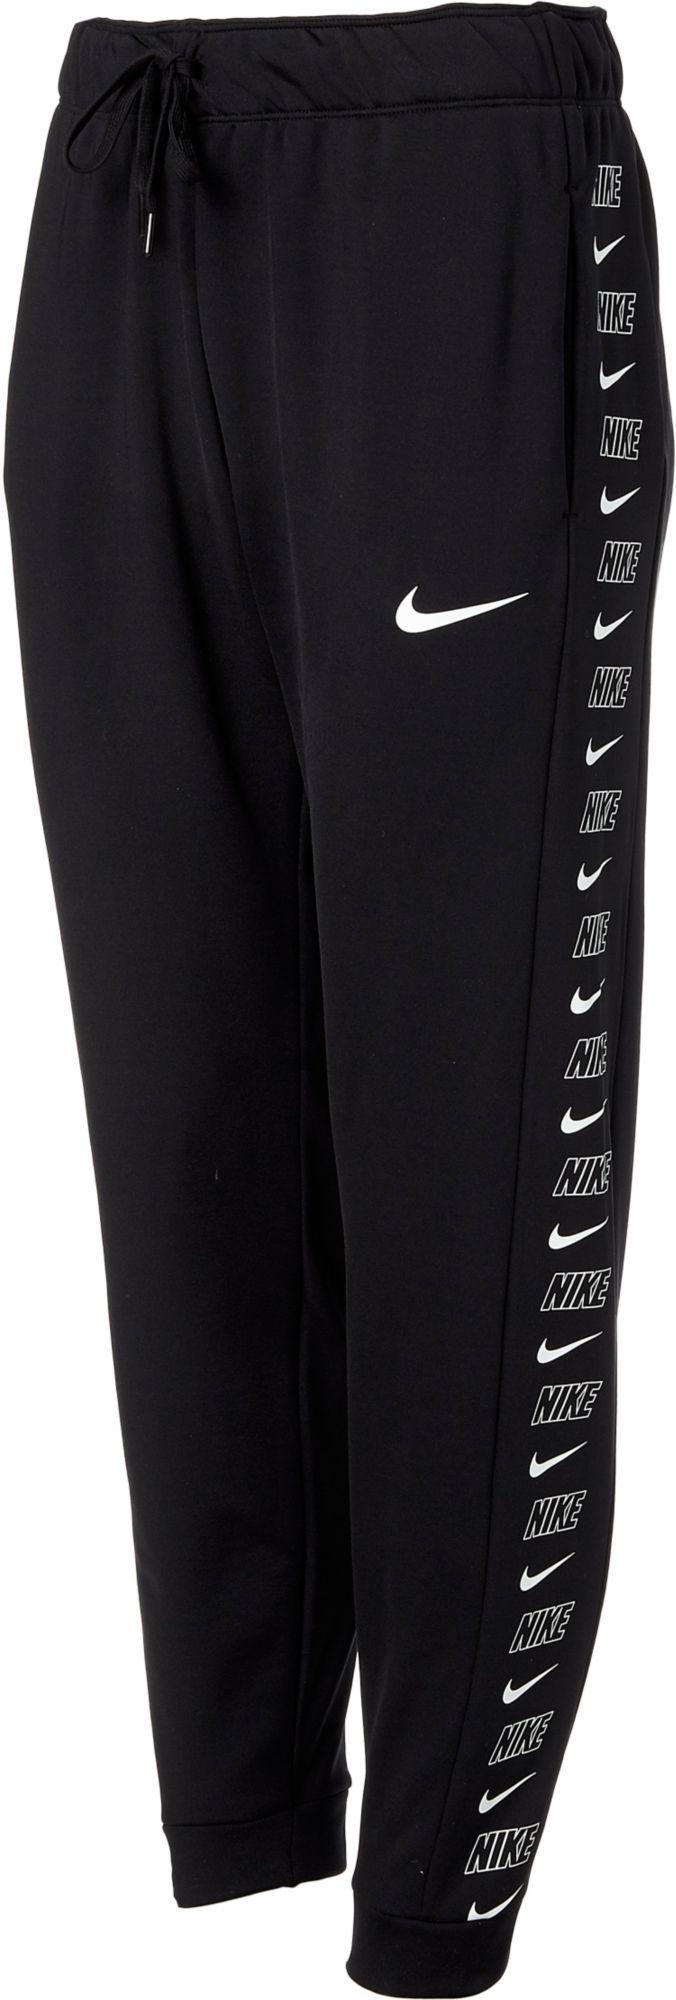 03e3b1196e Nike Women's Therma Fleece Training Pants | Products | Fleece pants ...